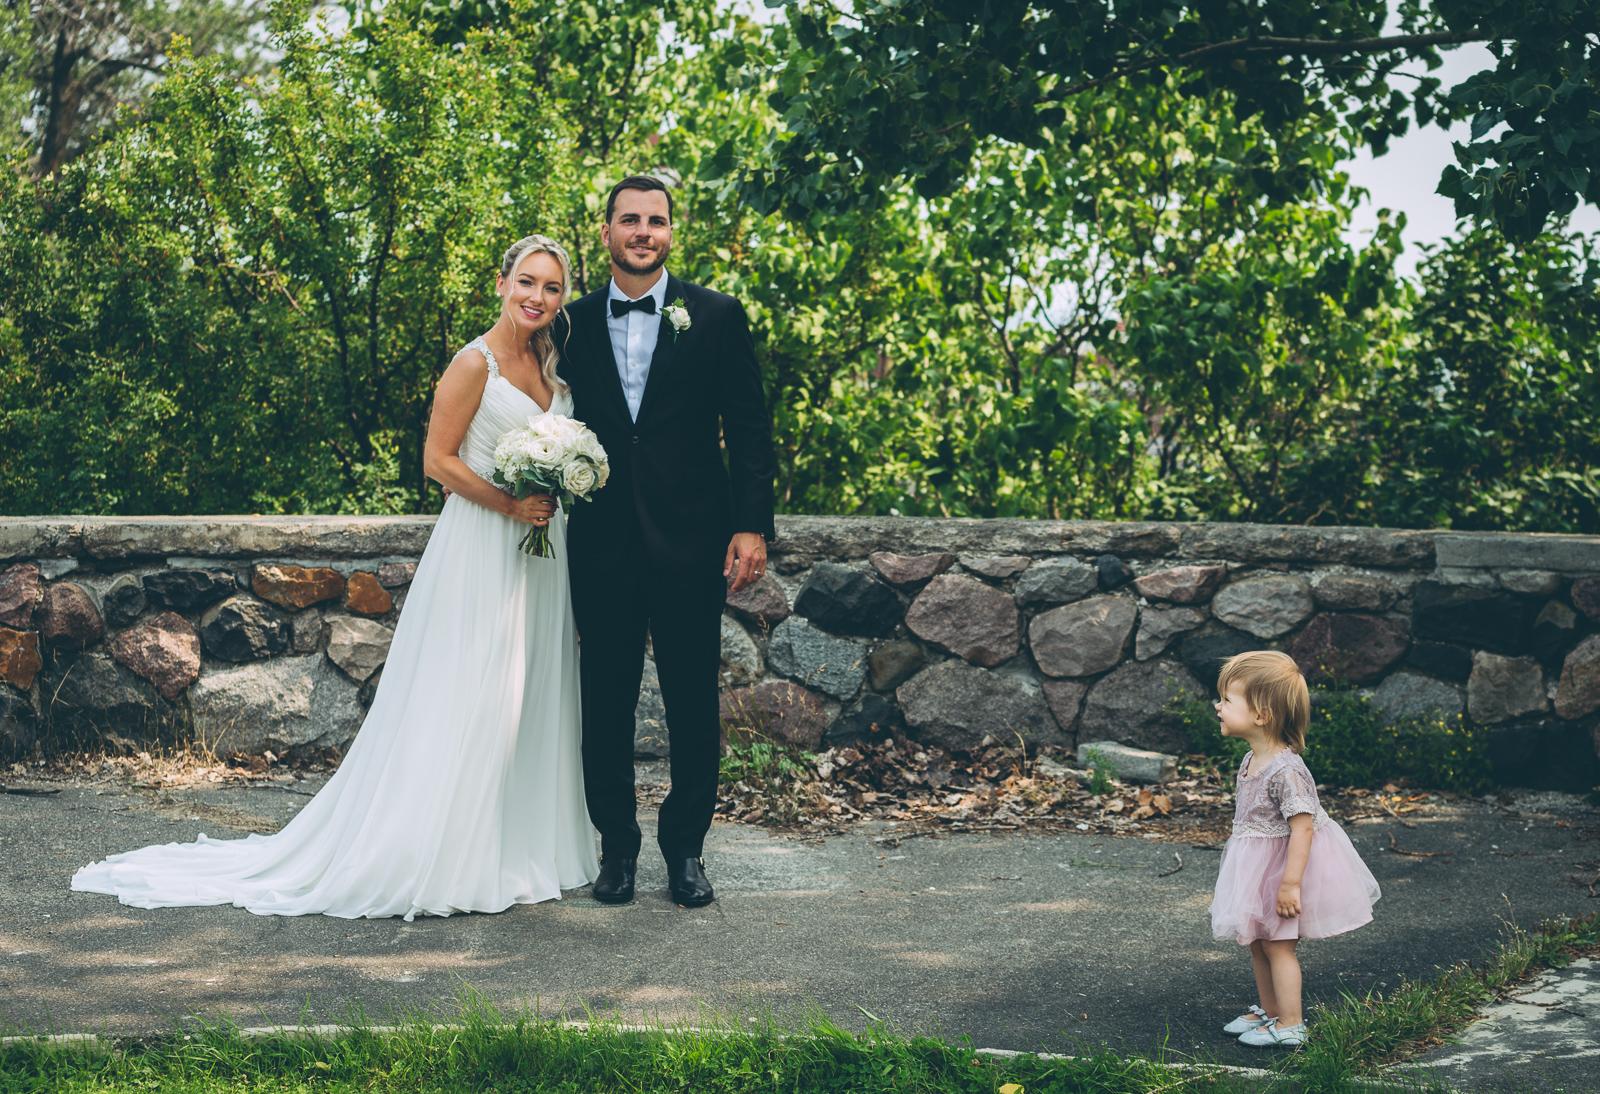 emily-jared-wedding-blog-66.jpg